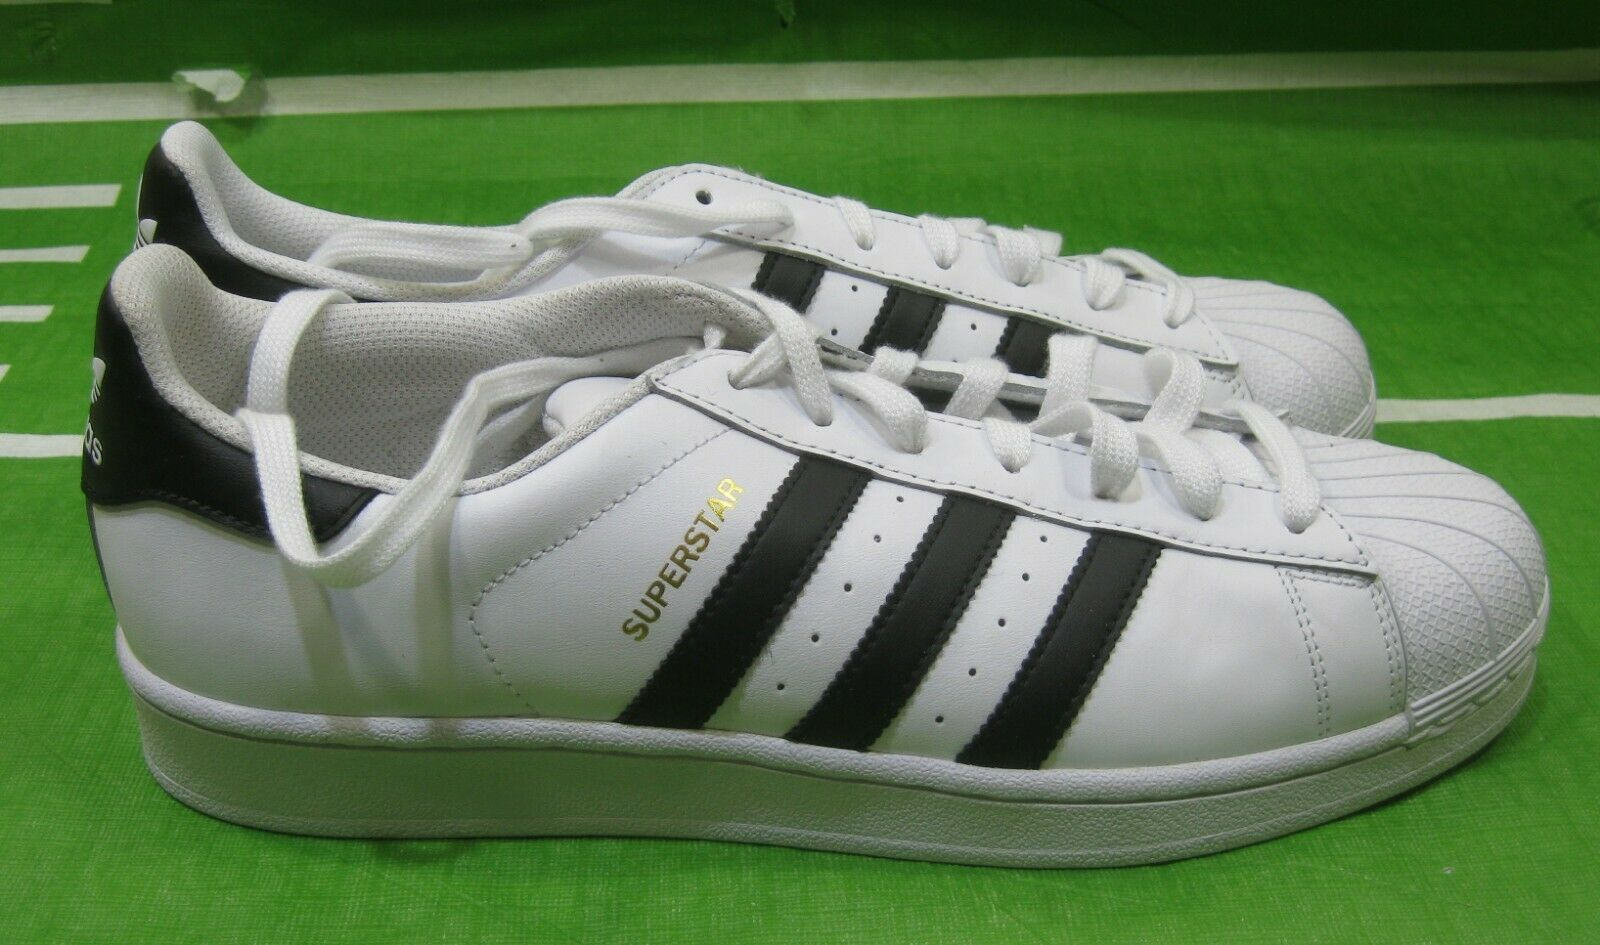 Adidas Originals Superstar Foundation SNEAKERS C77124  Size 10-10.5 10-10.5 10-10.5 8bba06